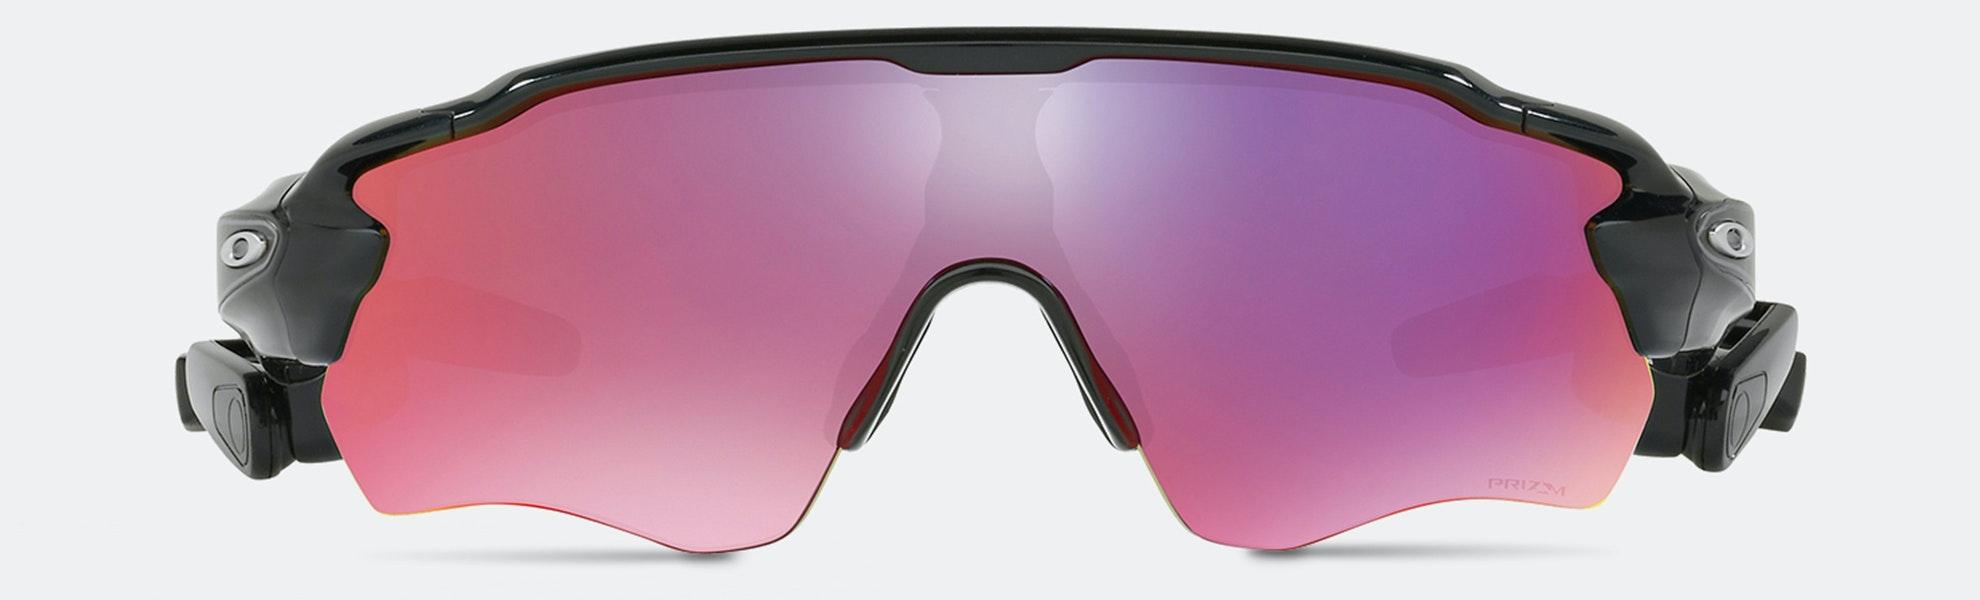 Oakley Bluetooth Sport Performance Sunglasses